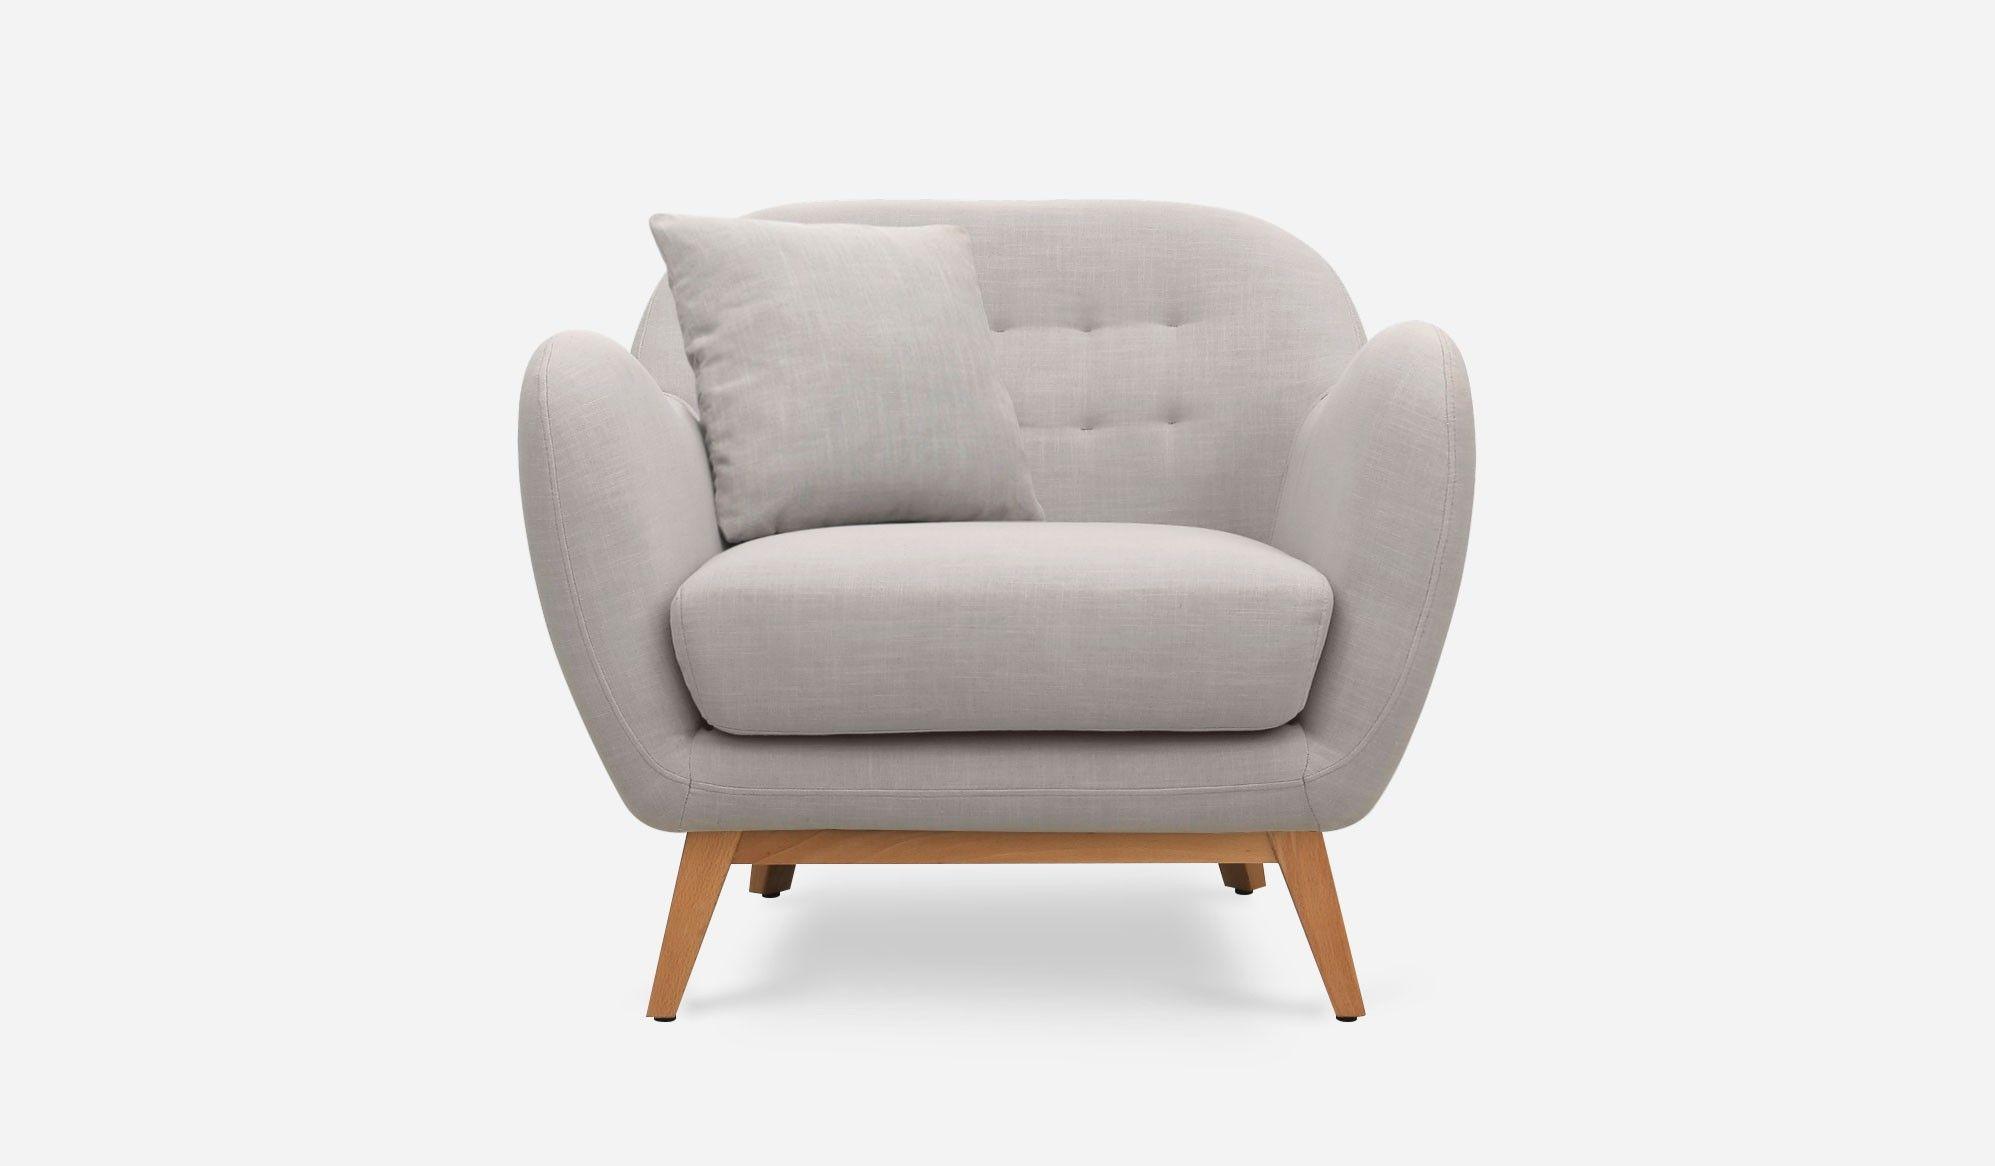 Compre Mid Century Mobiliario Moderno Mobiliario Otomano Sal N  # Muebles Otomanos